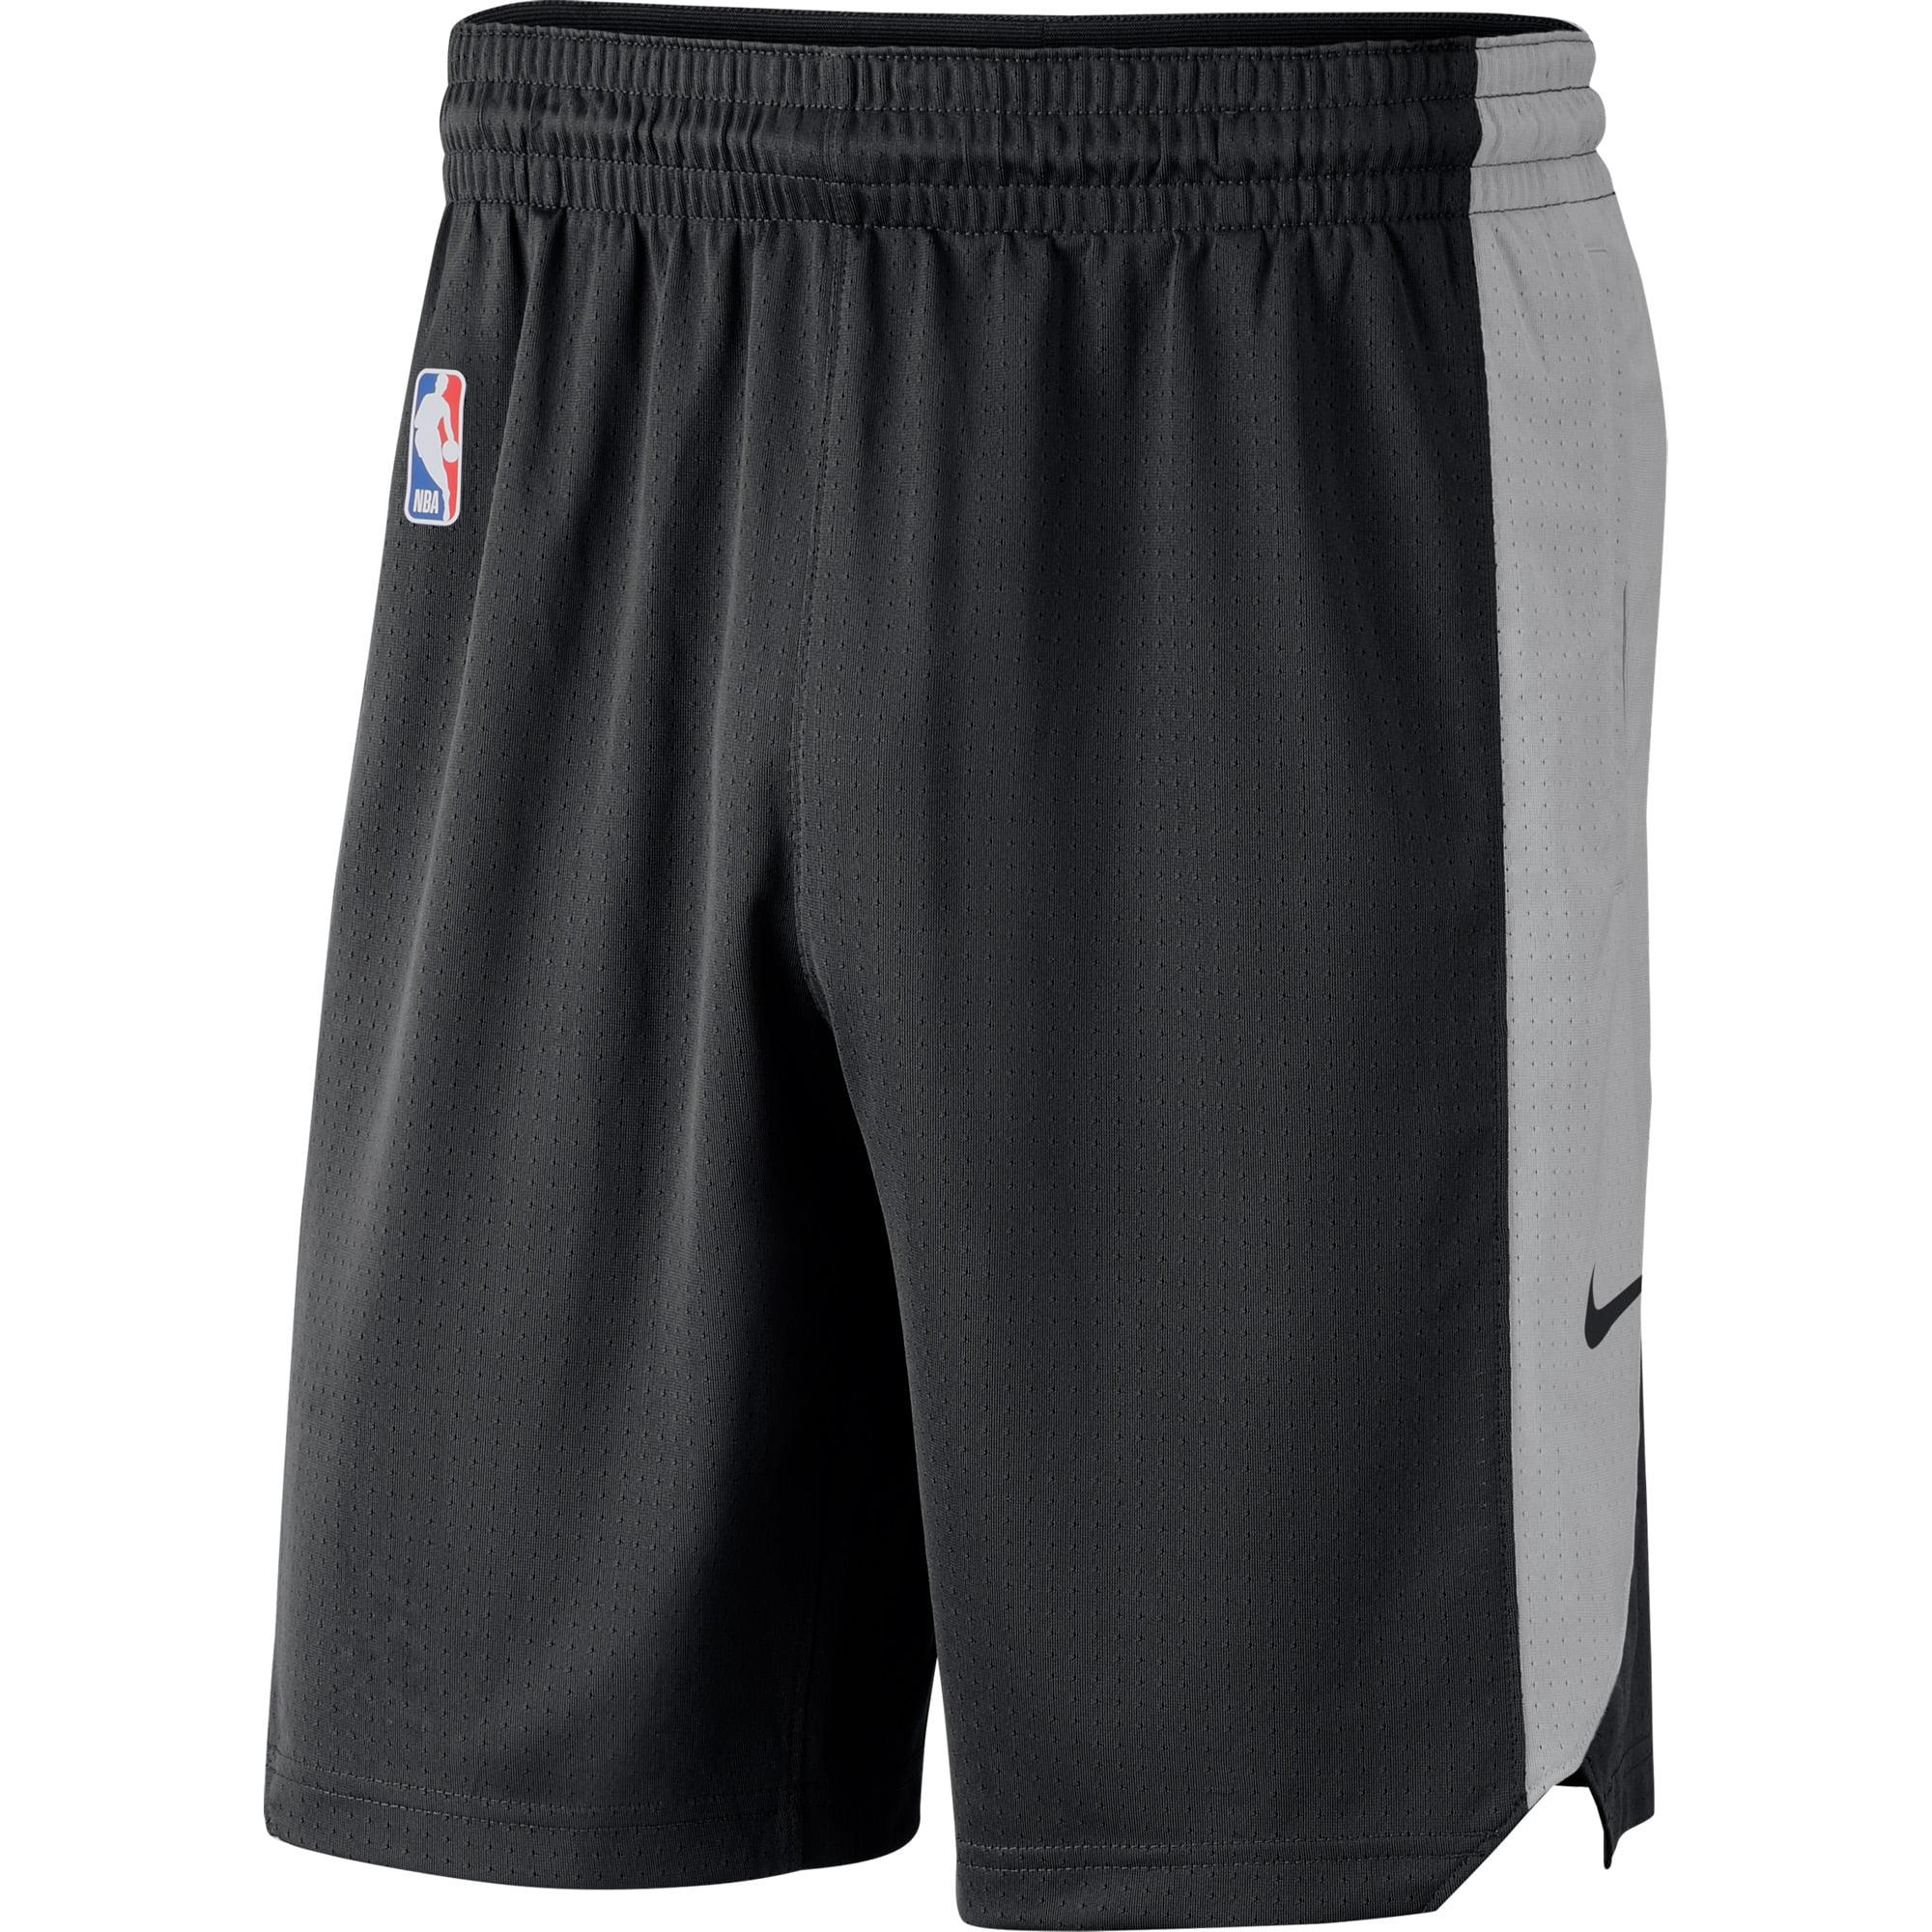 Brooklyn Nets Nike Performance Practice Shorts - Black